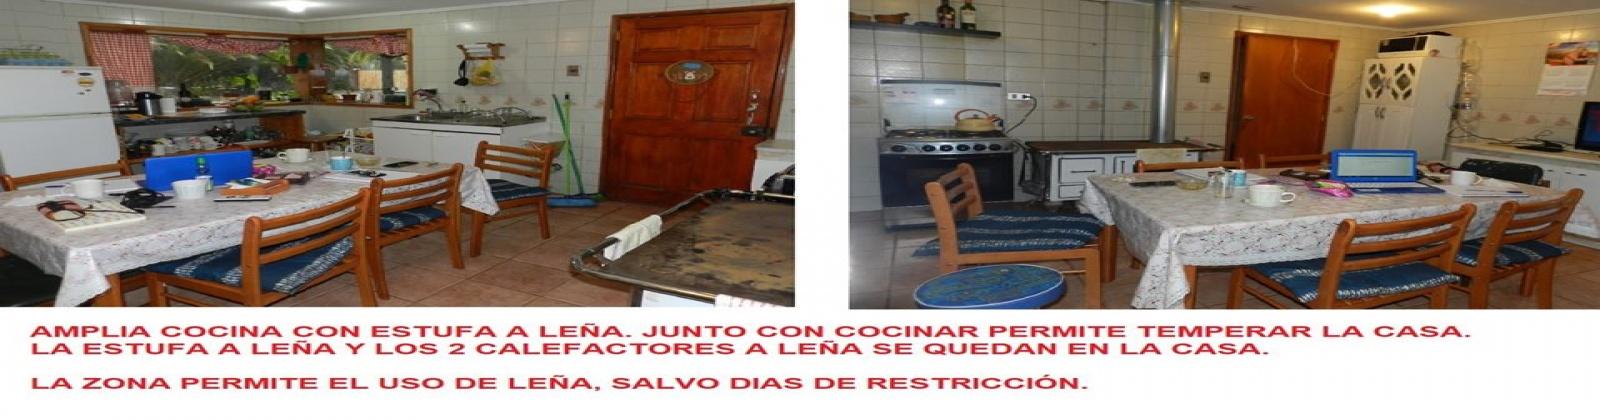 Paine, R. Metropolitana, ,Parcela,Venta,1051